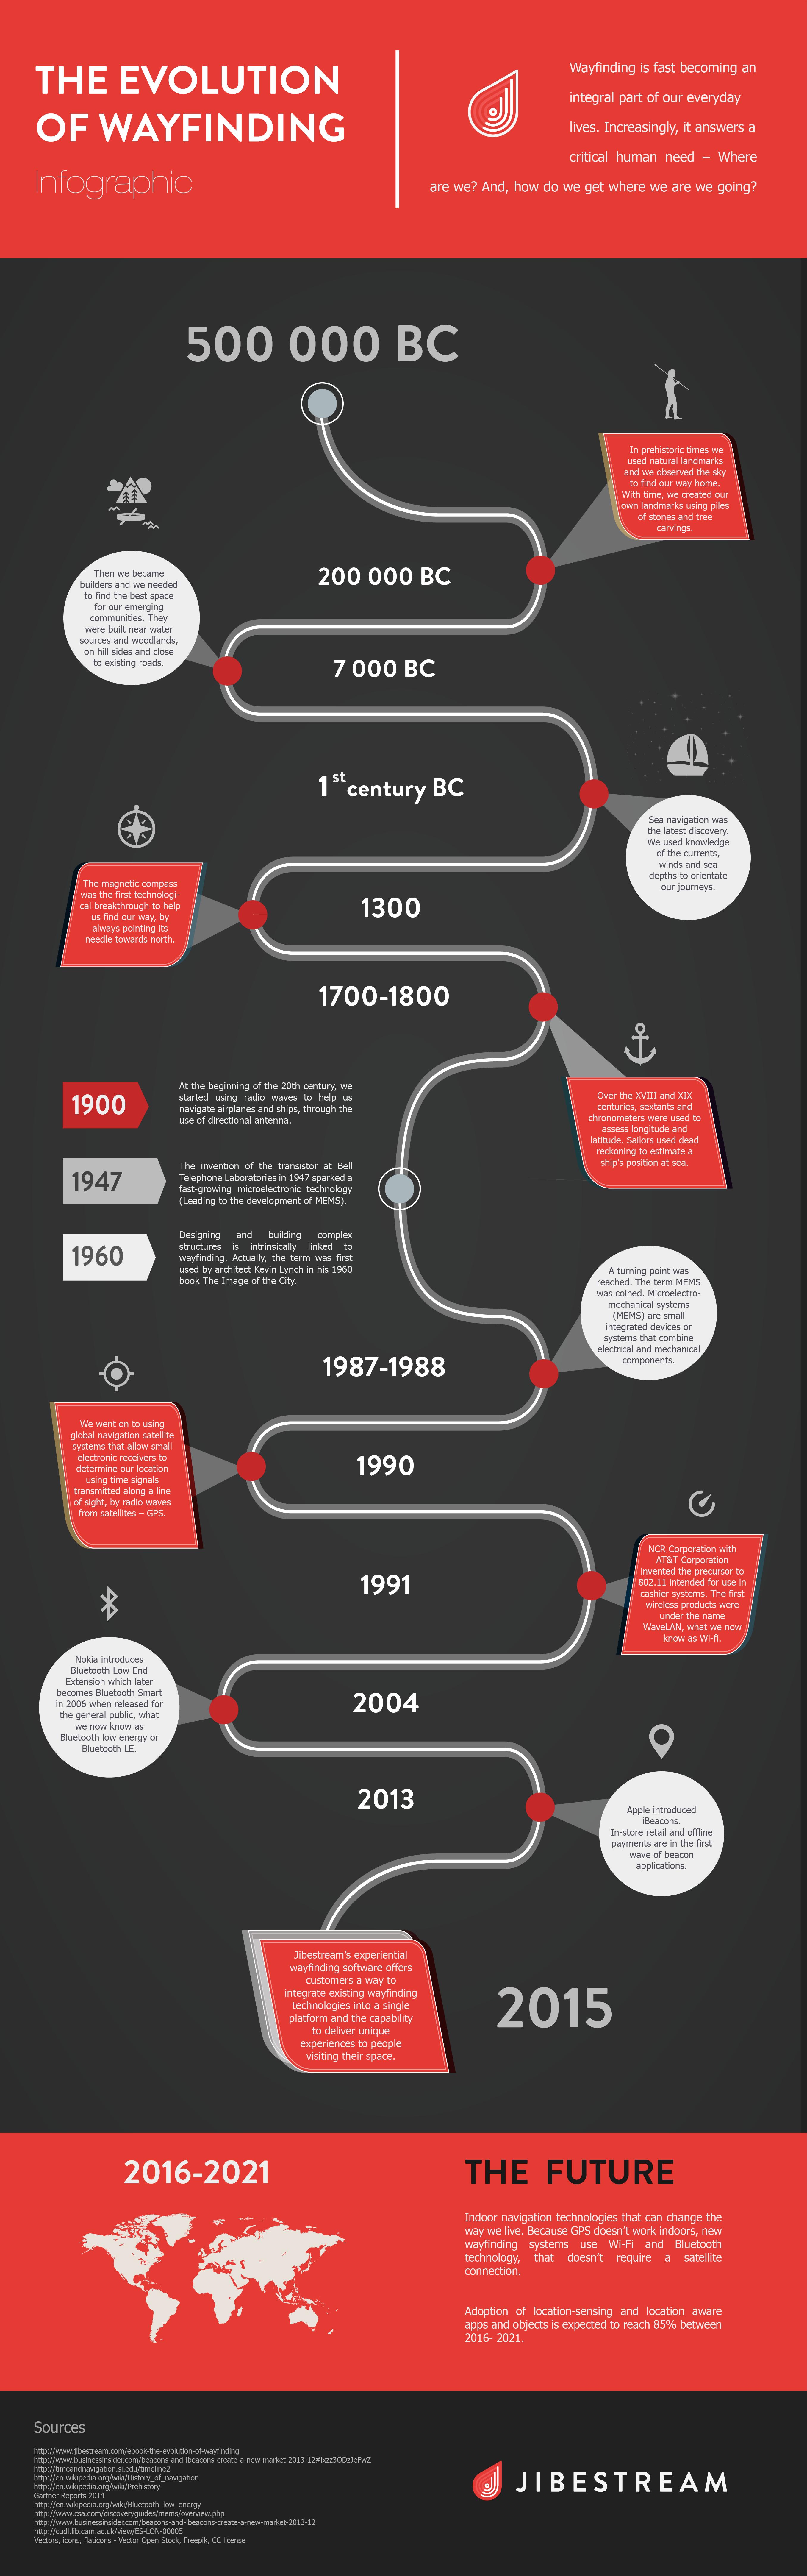 The Evolutio of Wayfinding Infographic